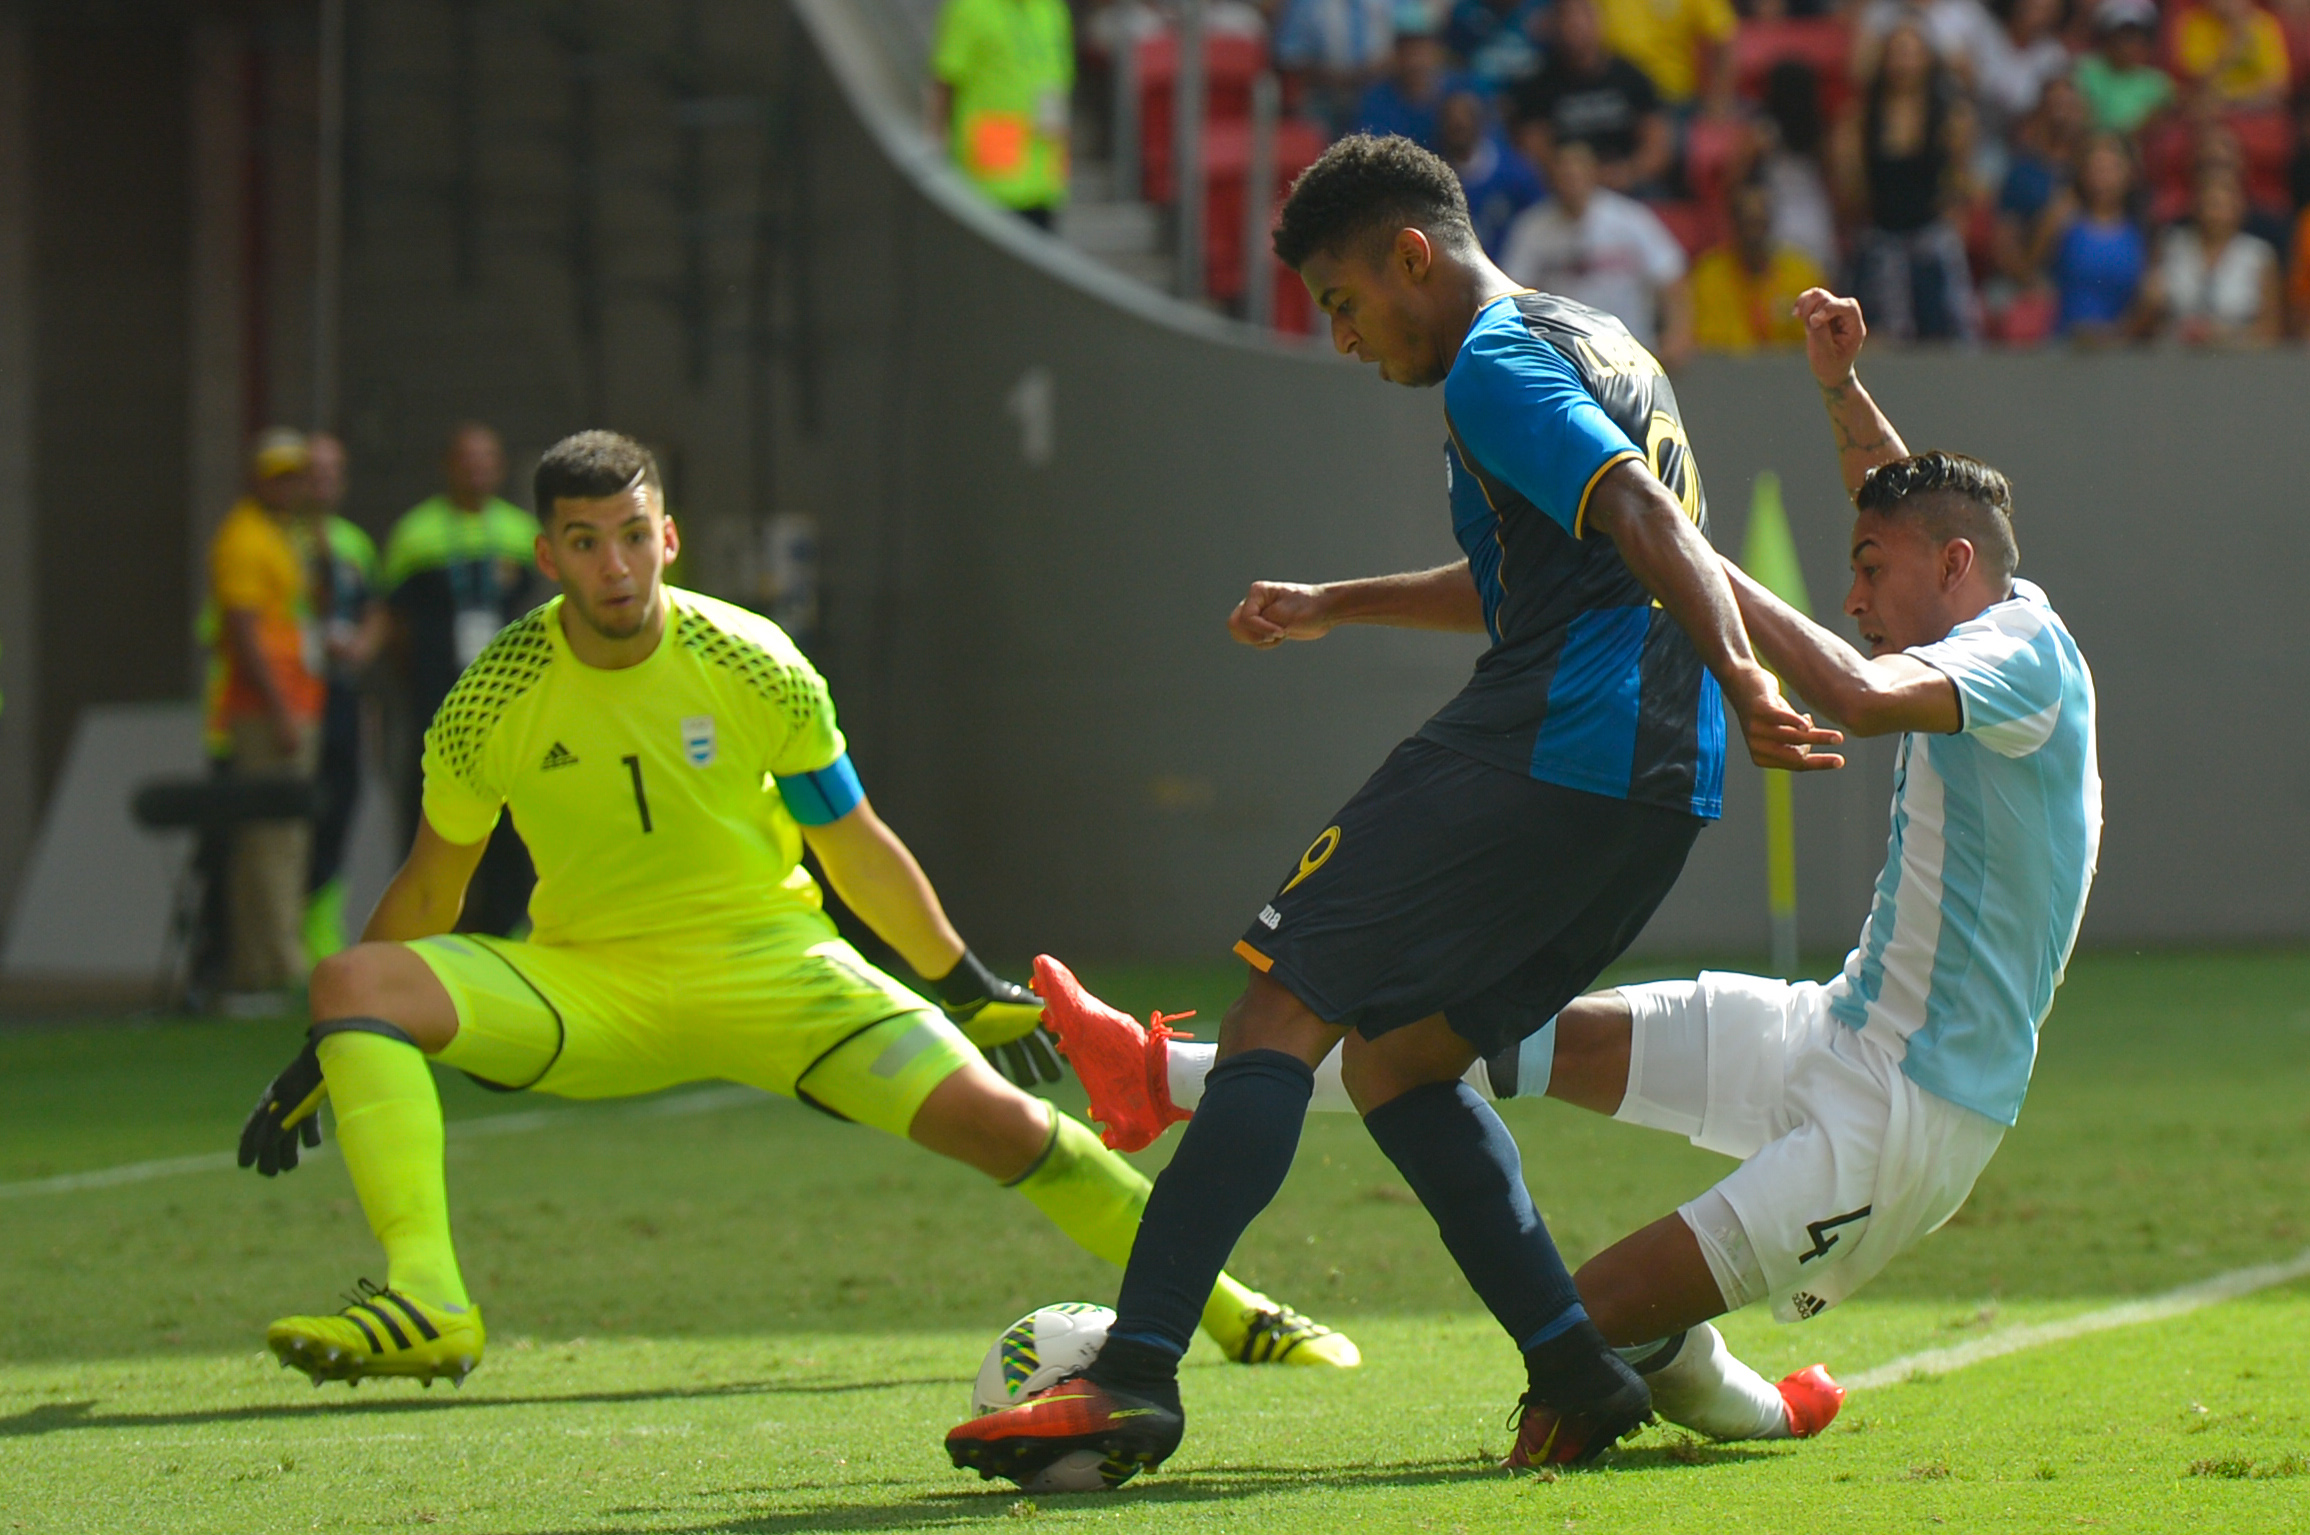 Состав футбольной команды Tigre, Аргентина